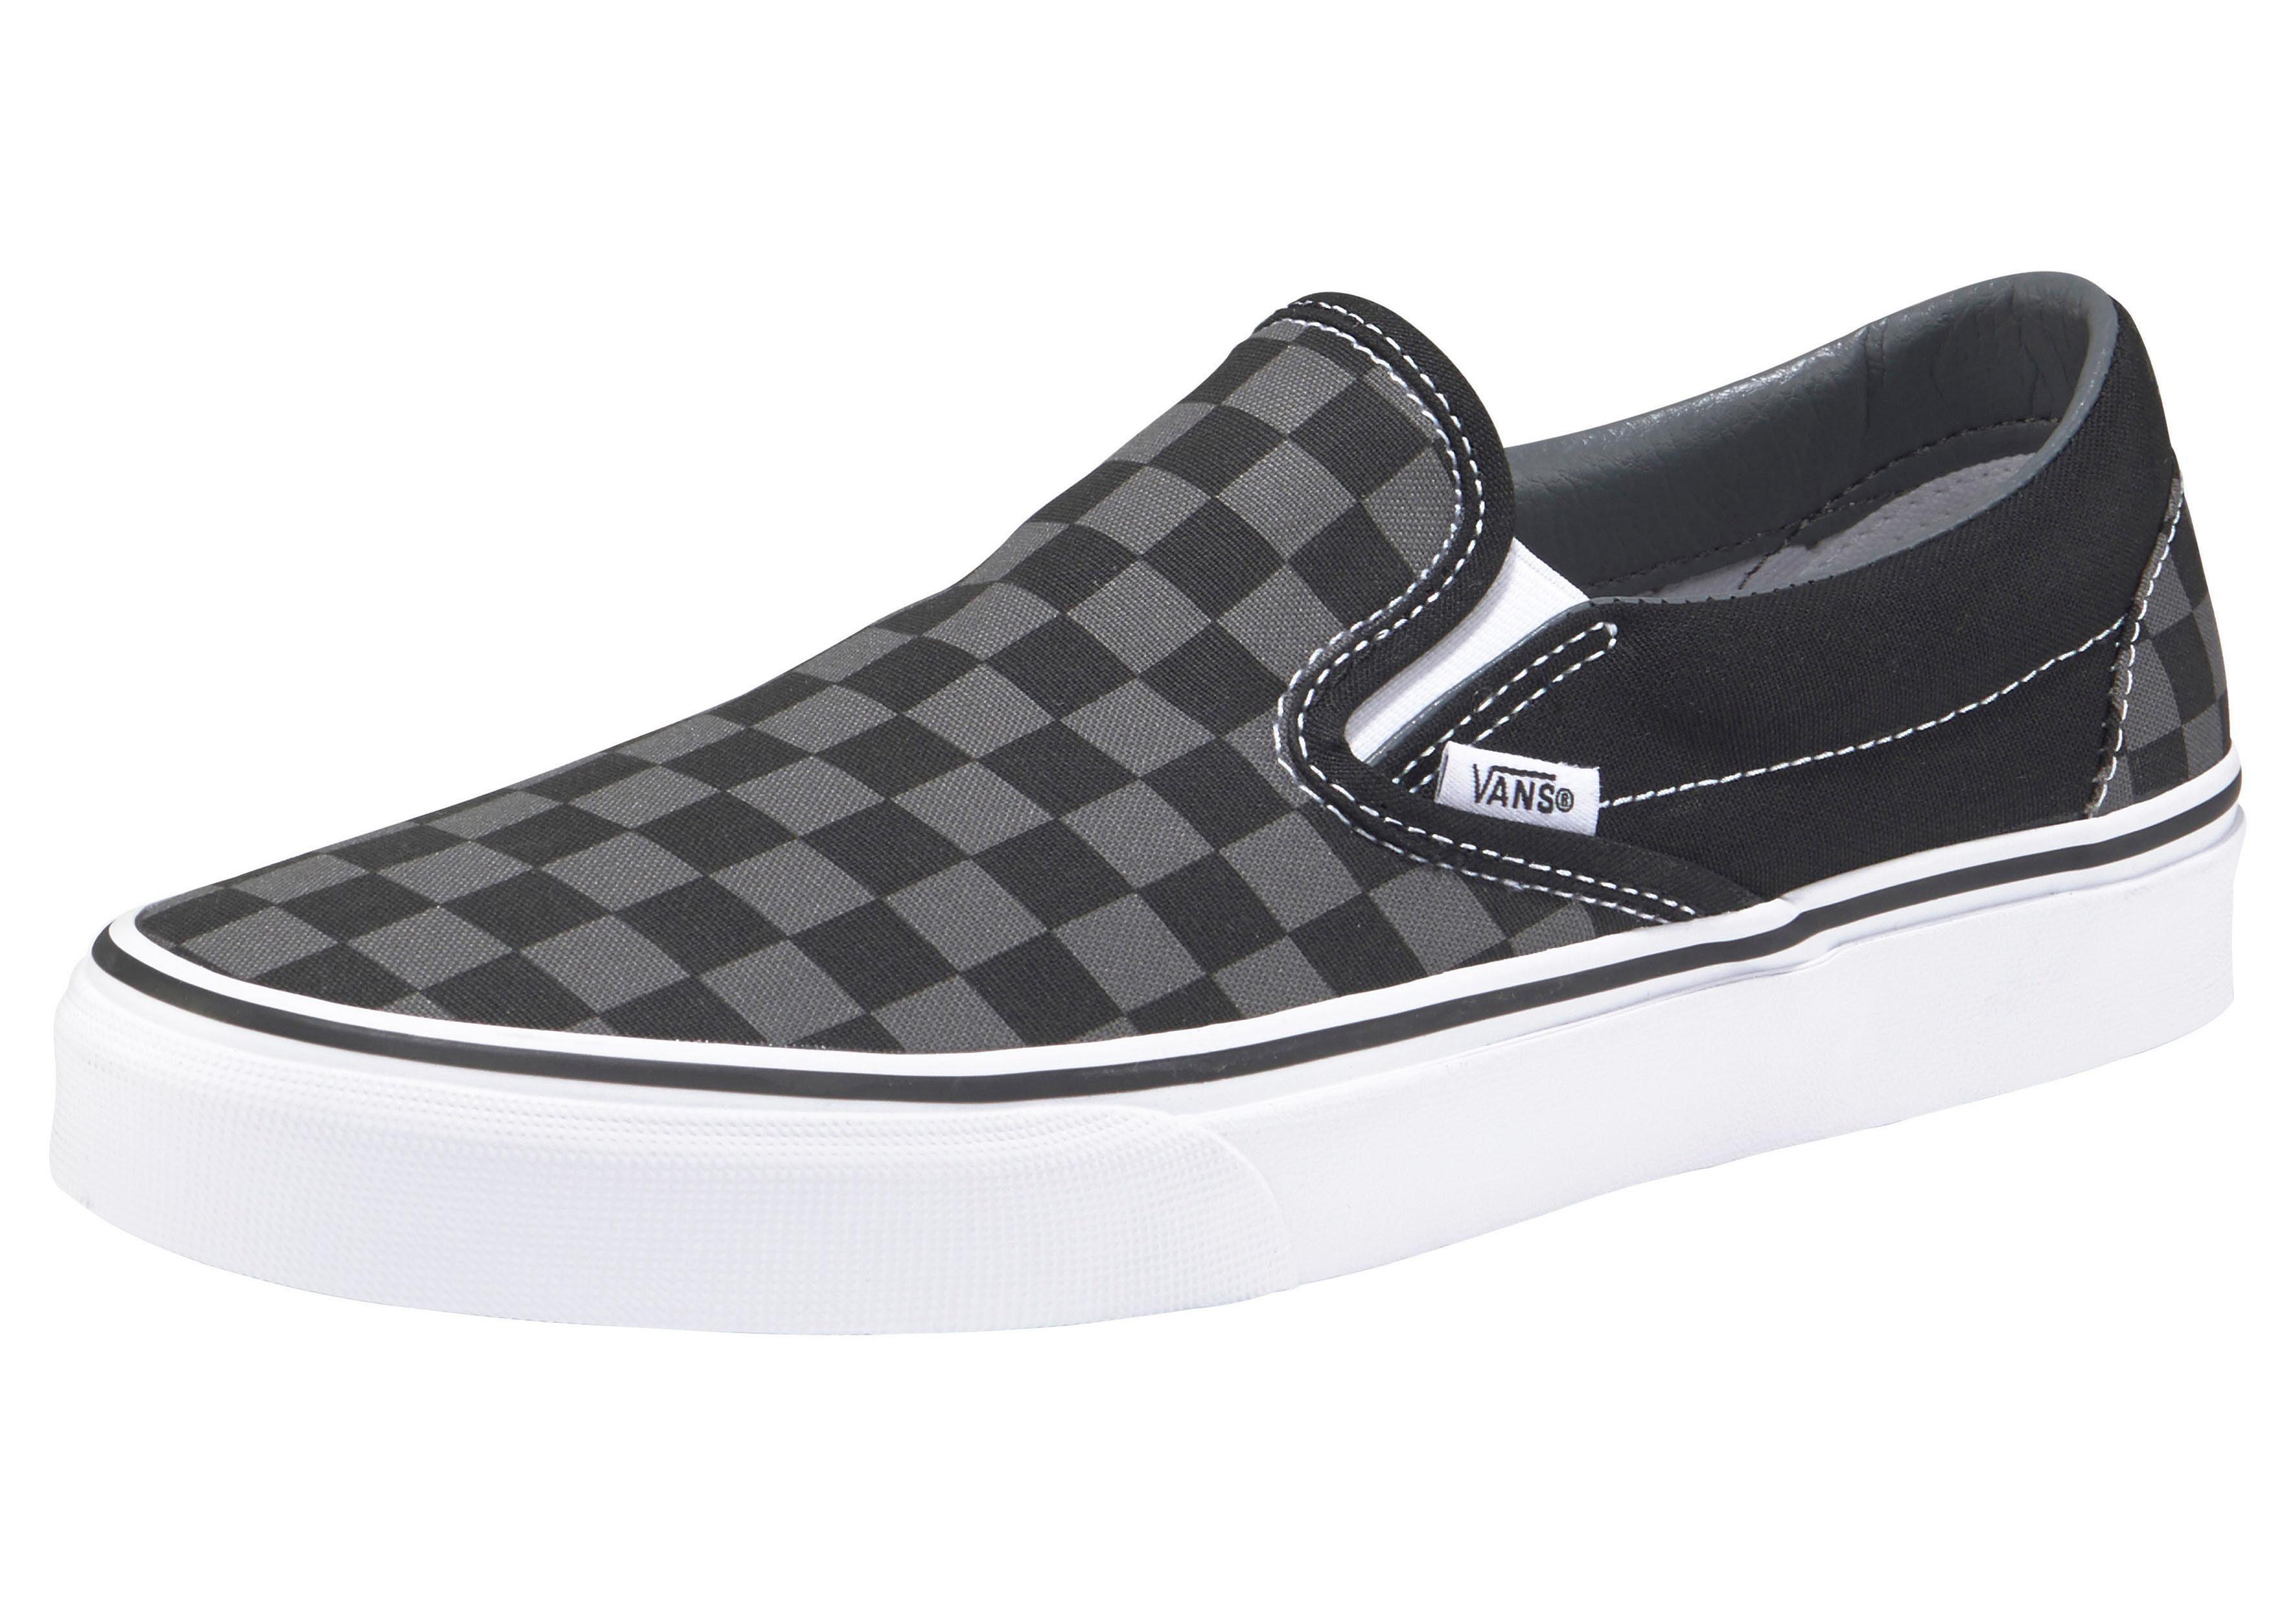 Vans »Checkerboard Classic Slip-On« Sneaker kaufen | OTTO